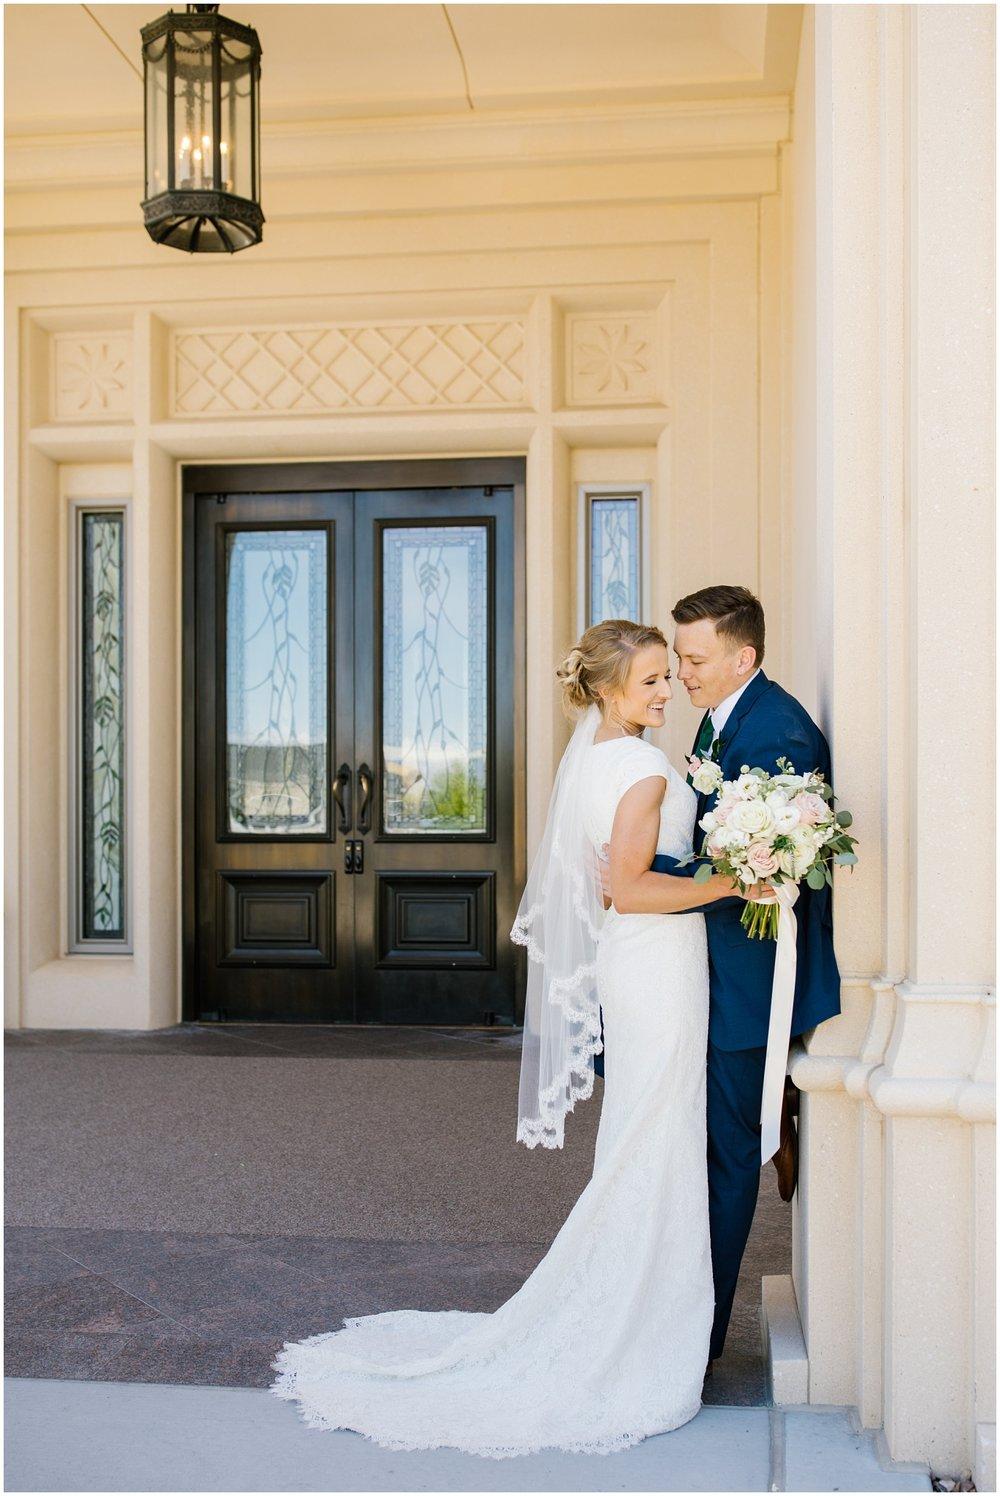 TA-Wedding-148_Lizzie-B-Imagery-Utah-Wedding-Photographer-Park-City-Salt-Lake-City-Thanksgiving-Point-Ashton-Gardens-Lehi-Utah.jpg